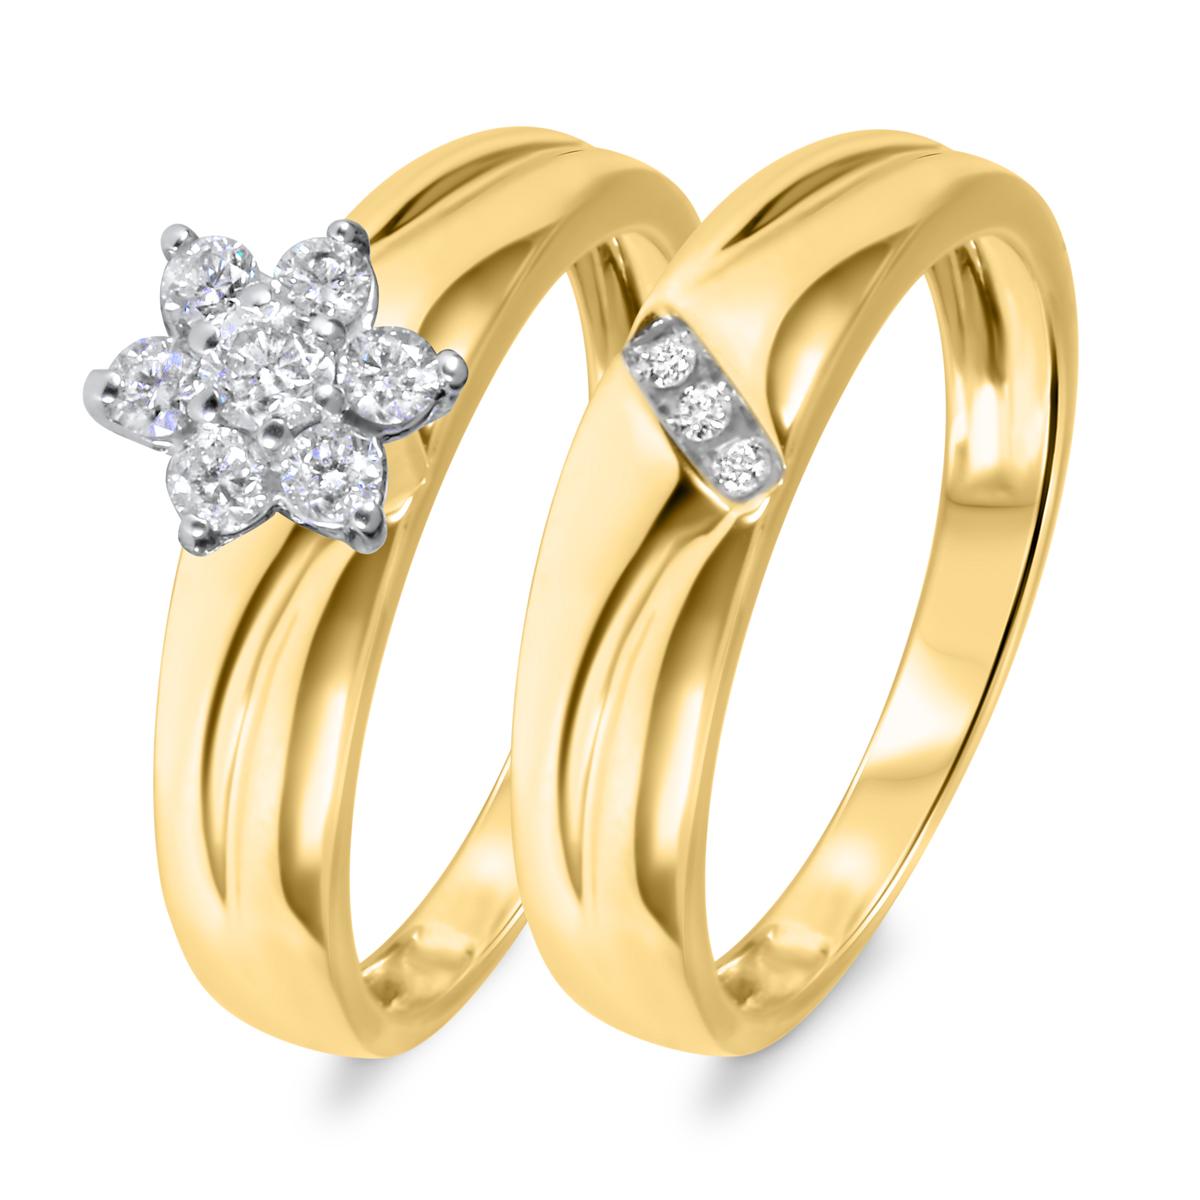 1/4 CT. T.W. Diamond Women's Bridal Wedding Ring Set 14K Yellow Gold